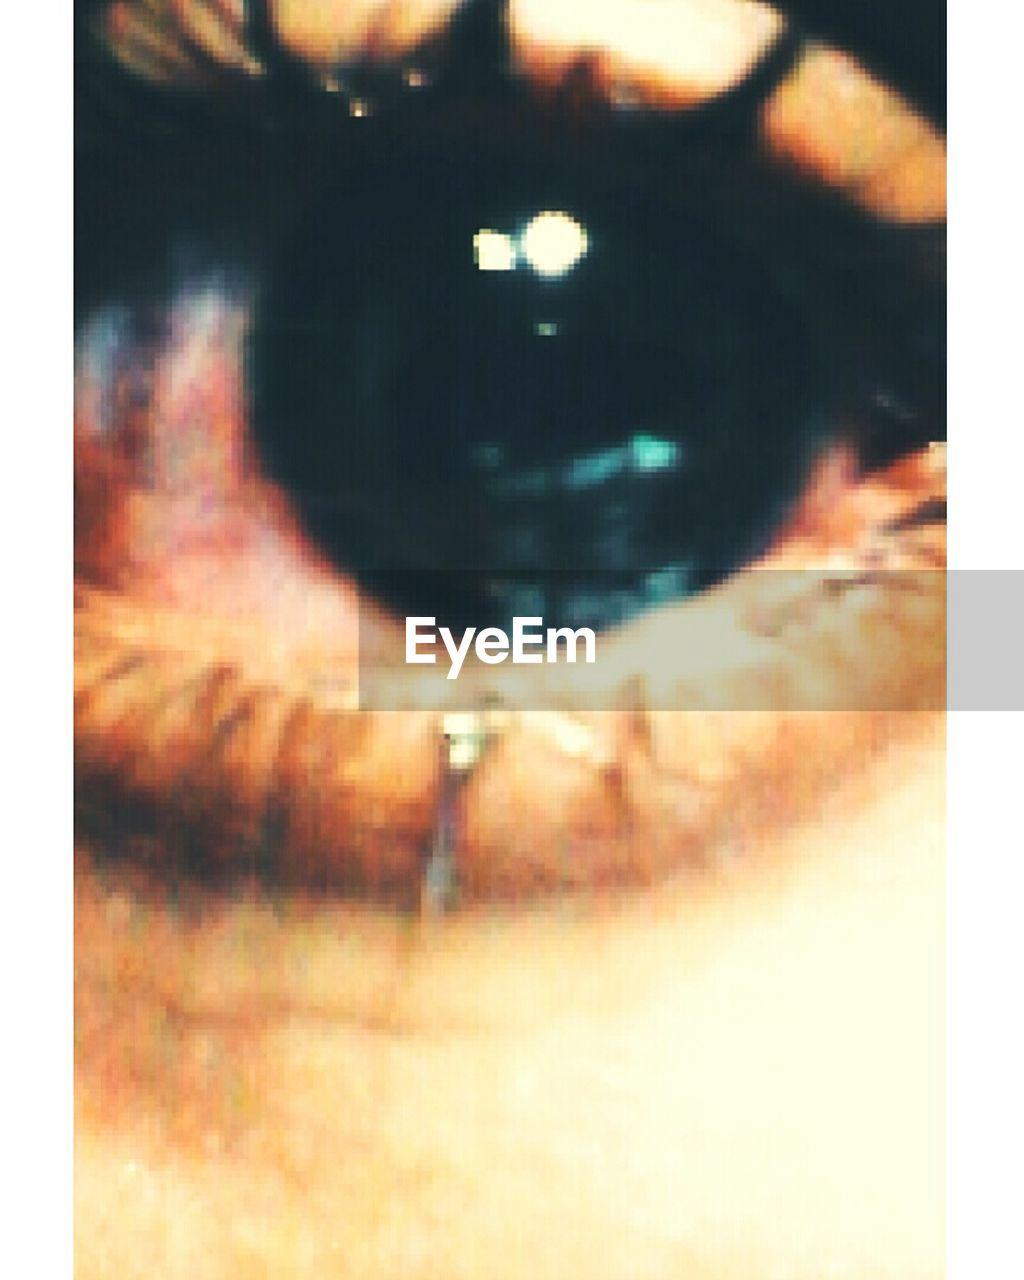 one person, close-up, real people, full frame, backgrounds, human eye, human body part, eyesight, outdoors, eyelash, day, eyeball, people